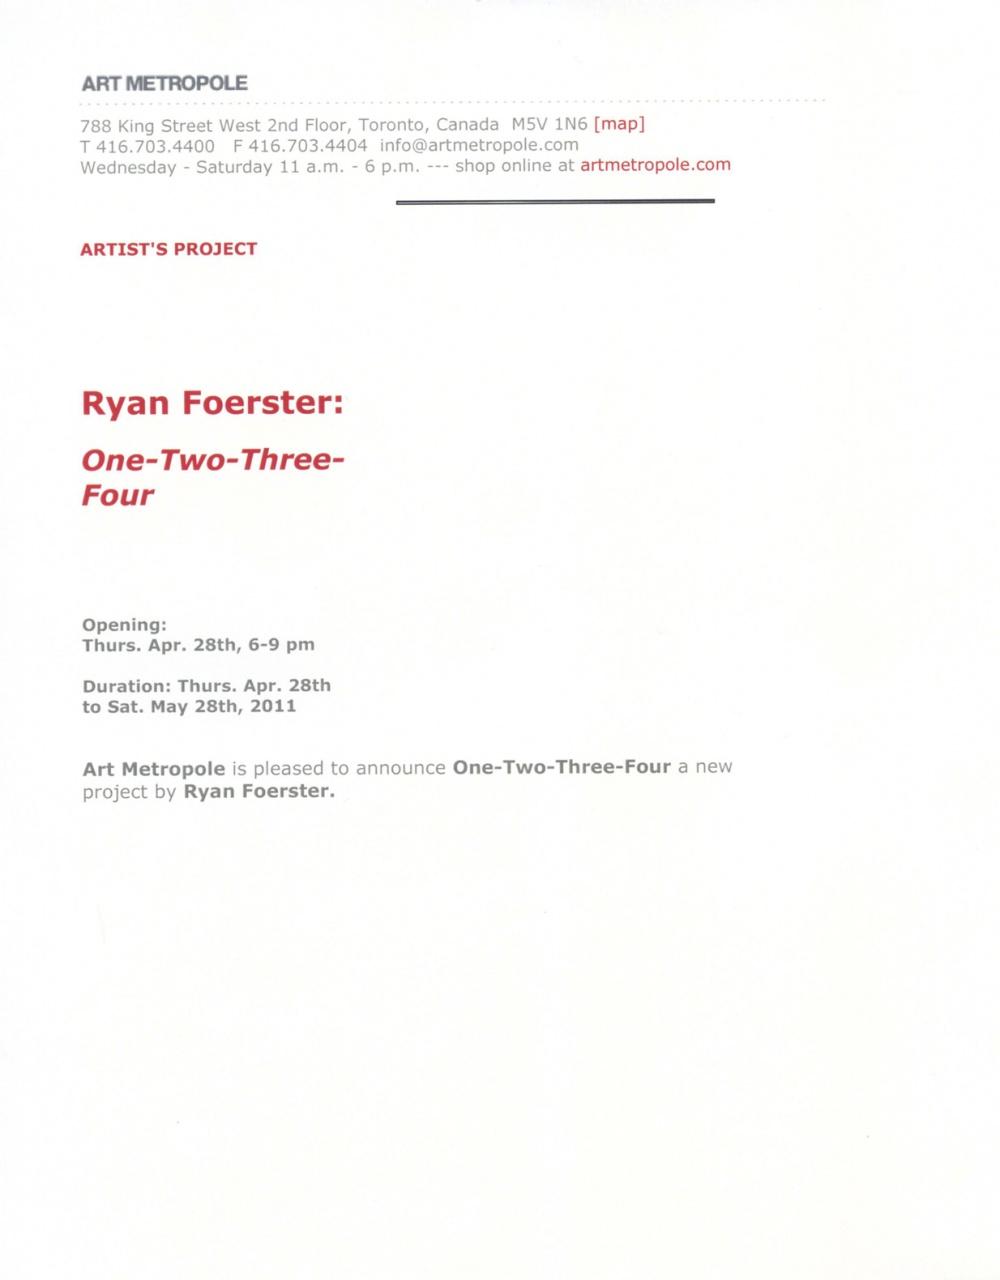 AMA1106.1, page 1